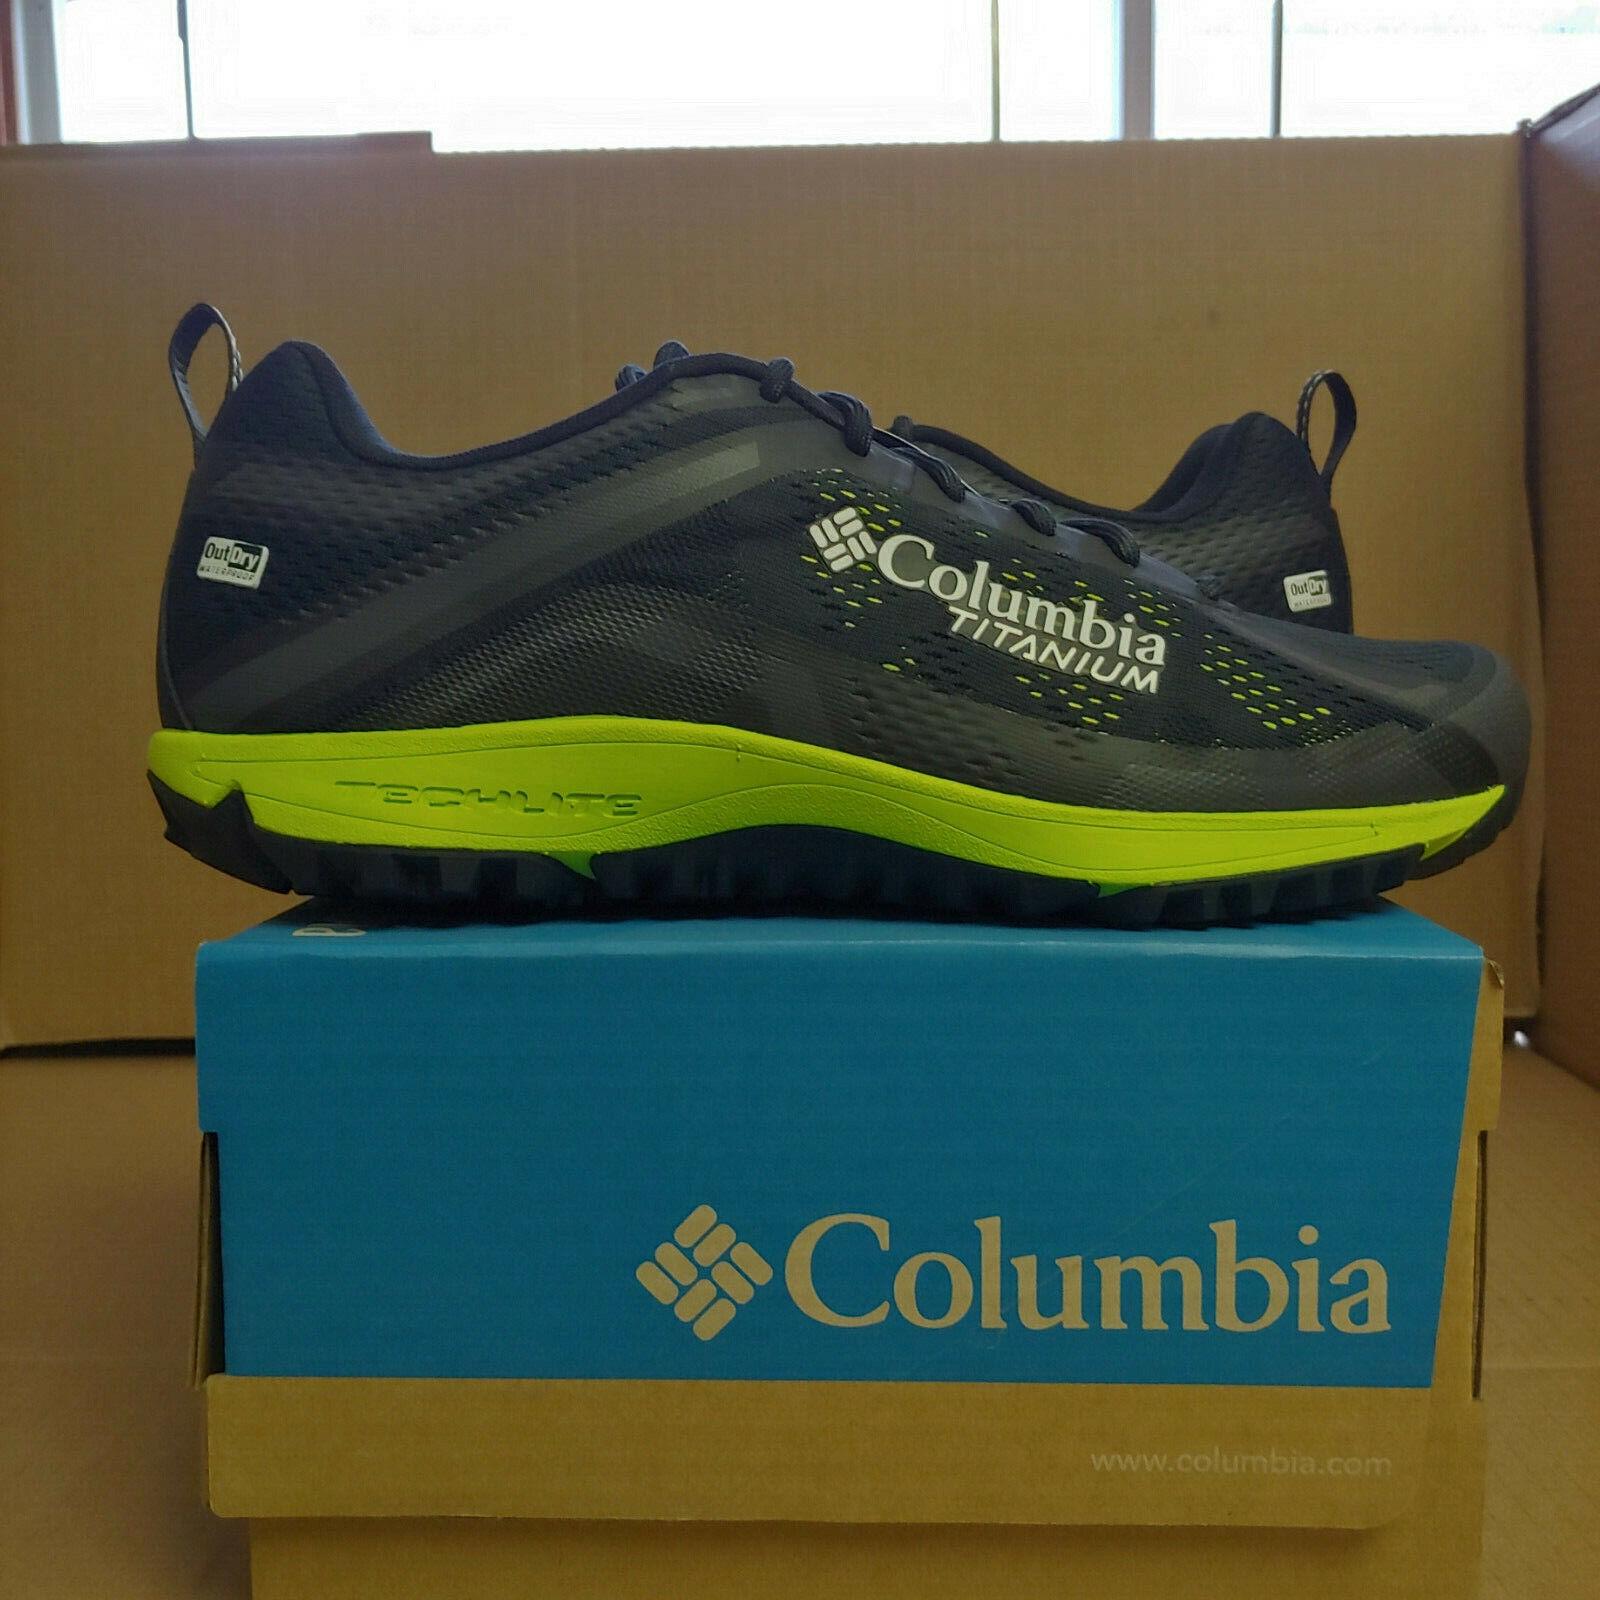 Columbia  Conspiracy III Titanium Outdry  Mens Size 11.5 BM 4591-010